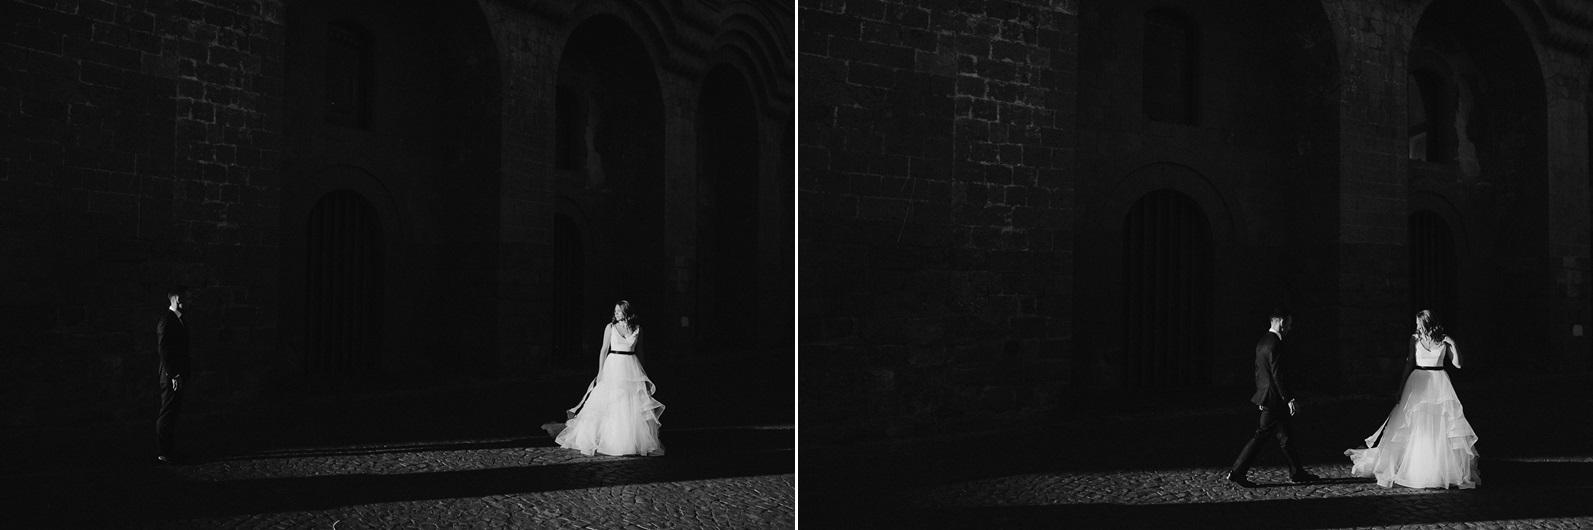 stylish-elopement-photographer-italy (127).jpg